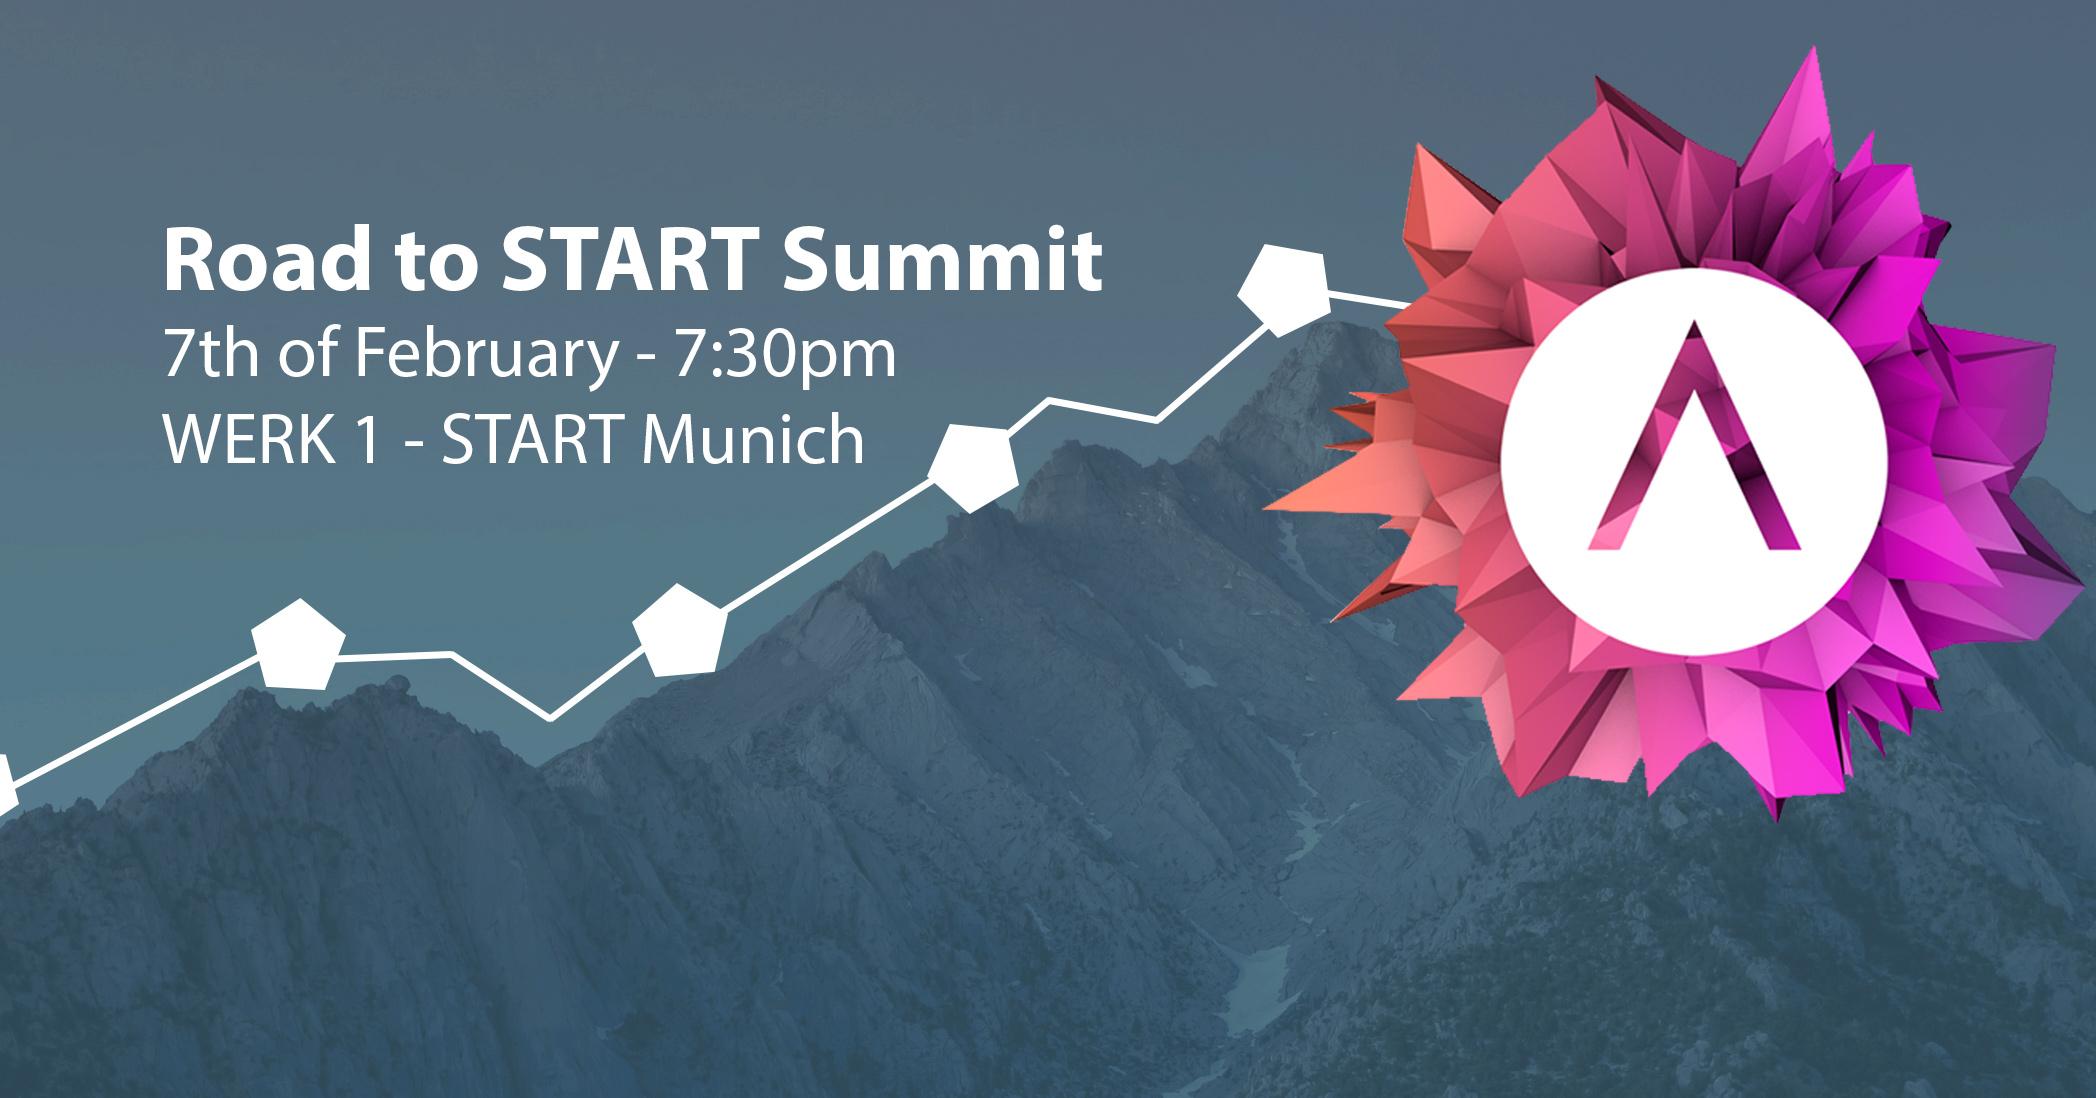 Road to START Summit 2019